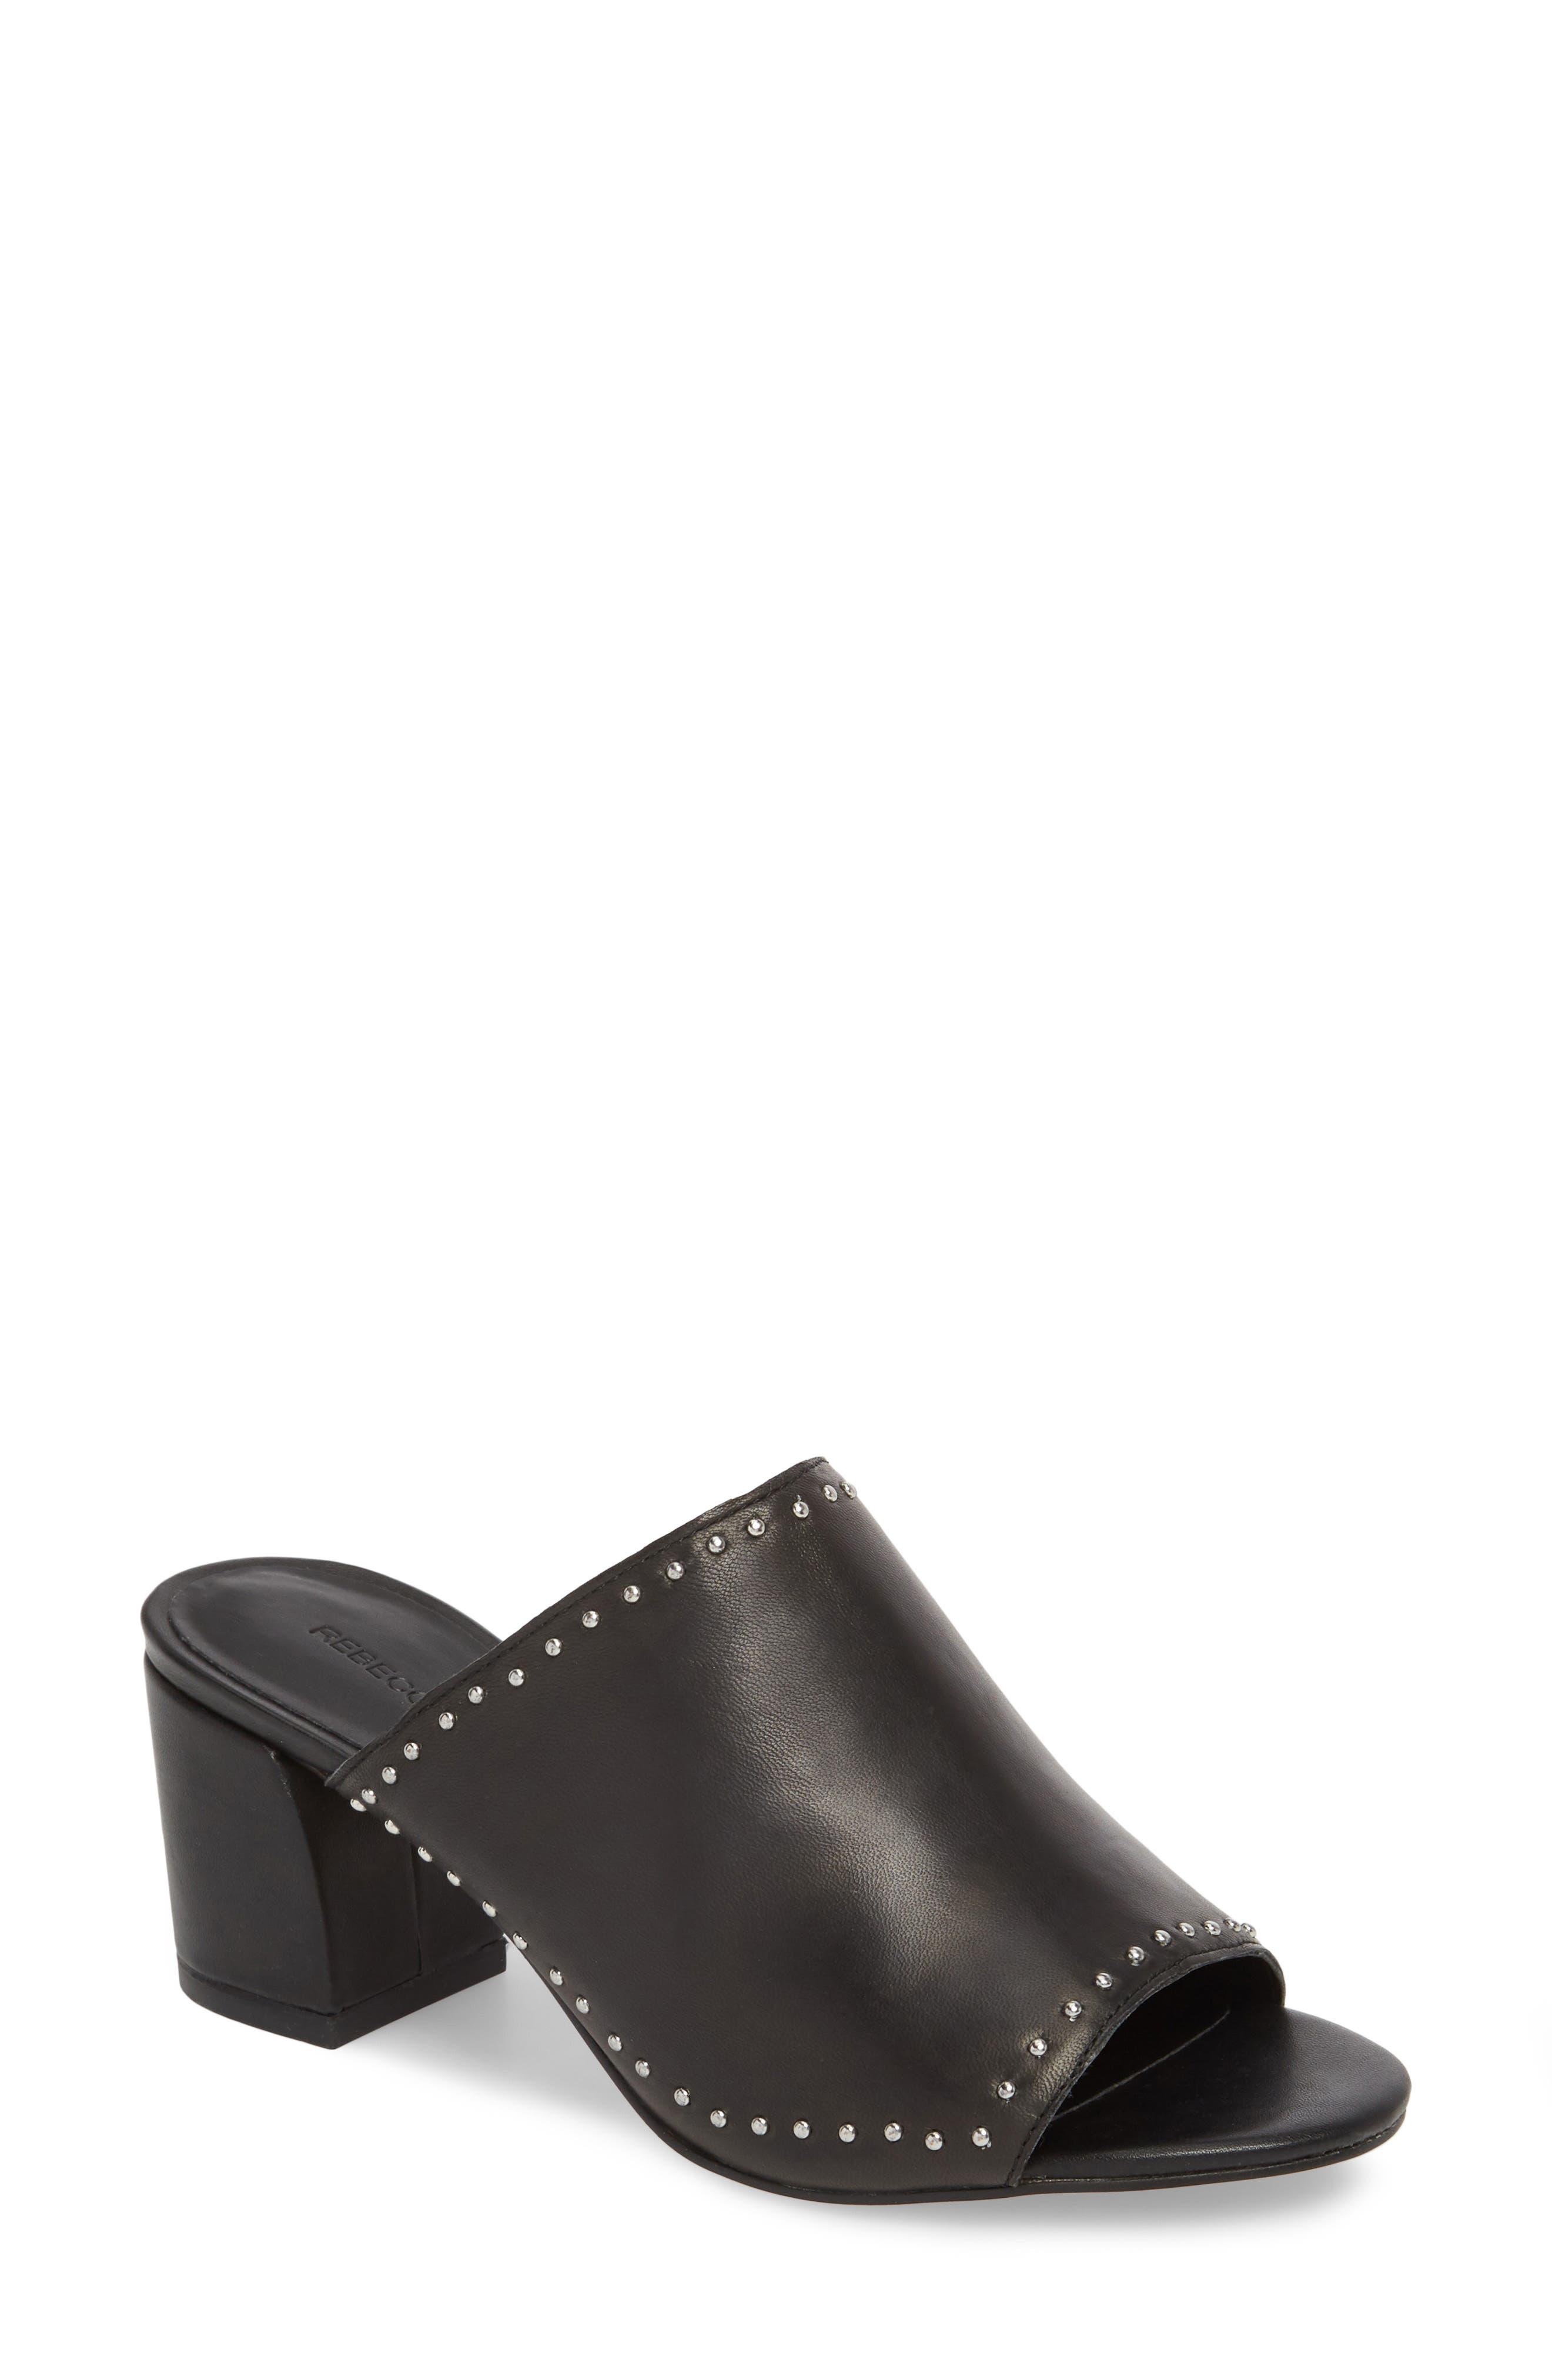 Lainy Studded Mule,                             Main thumbnail 1, color,                             Black Leather